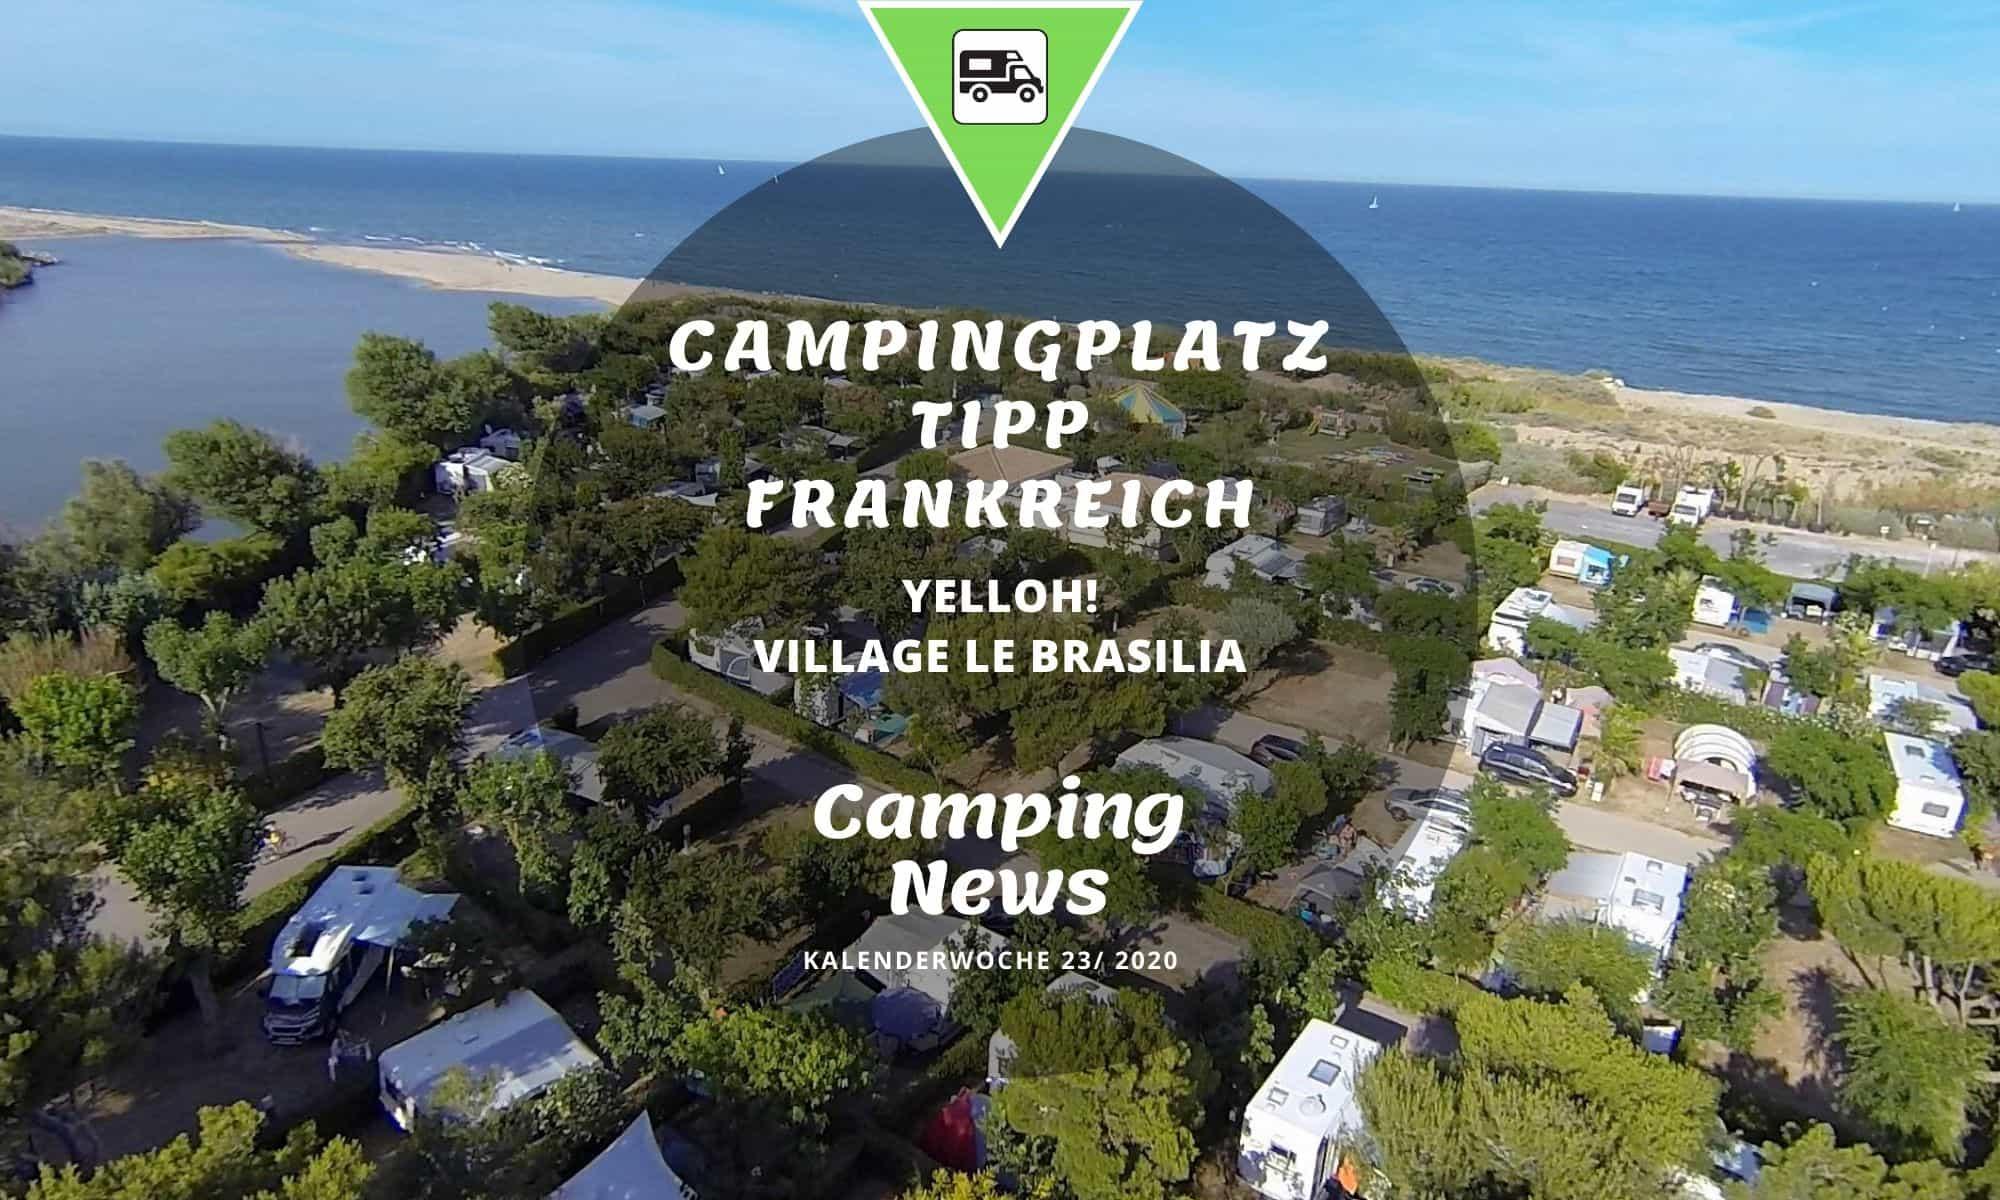 Campingplatz Tipp Frankreich